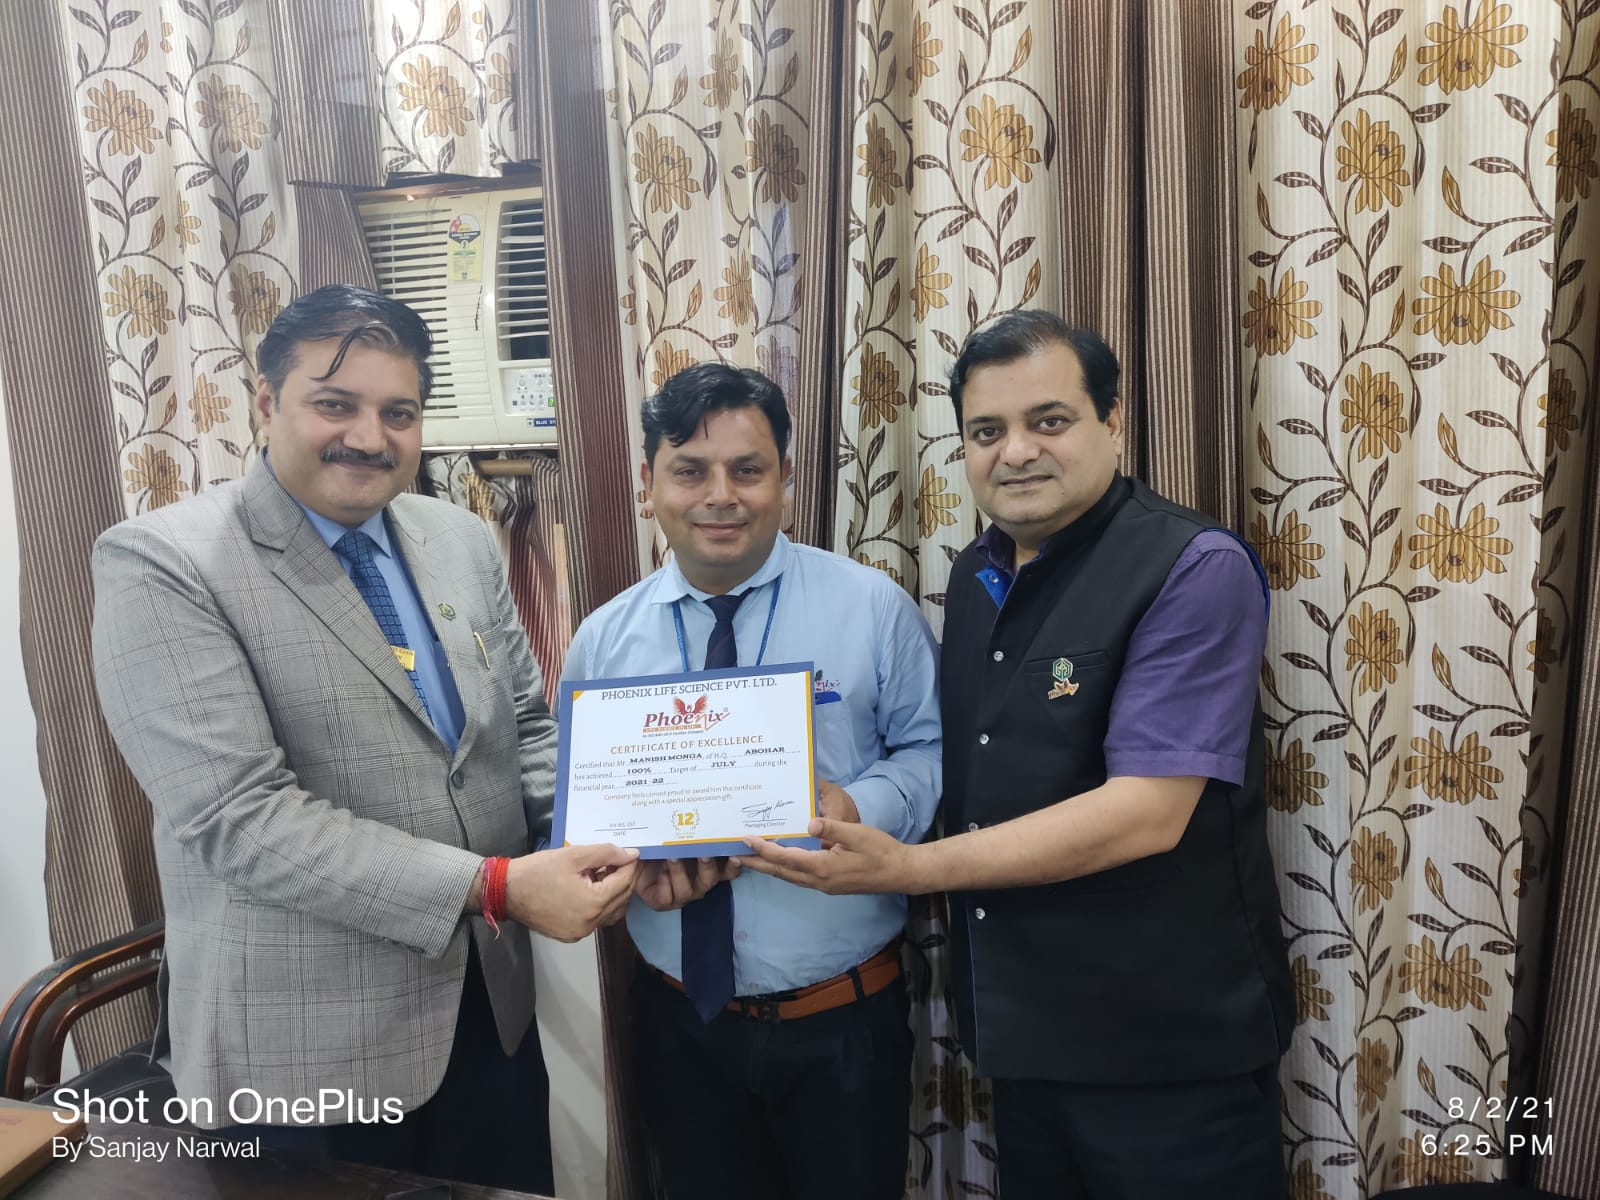 Manish Monga awarded by Dr. Sanjay Narwal MD, Phoenix Life Science and Dr. Shashi Shekhar Upadhyay Country Head Phoenix Life Science Pvt. Ltd.